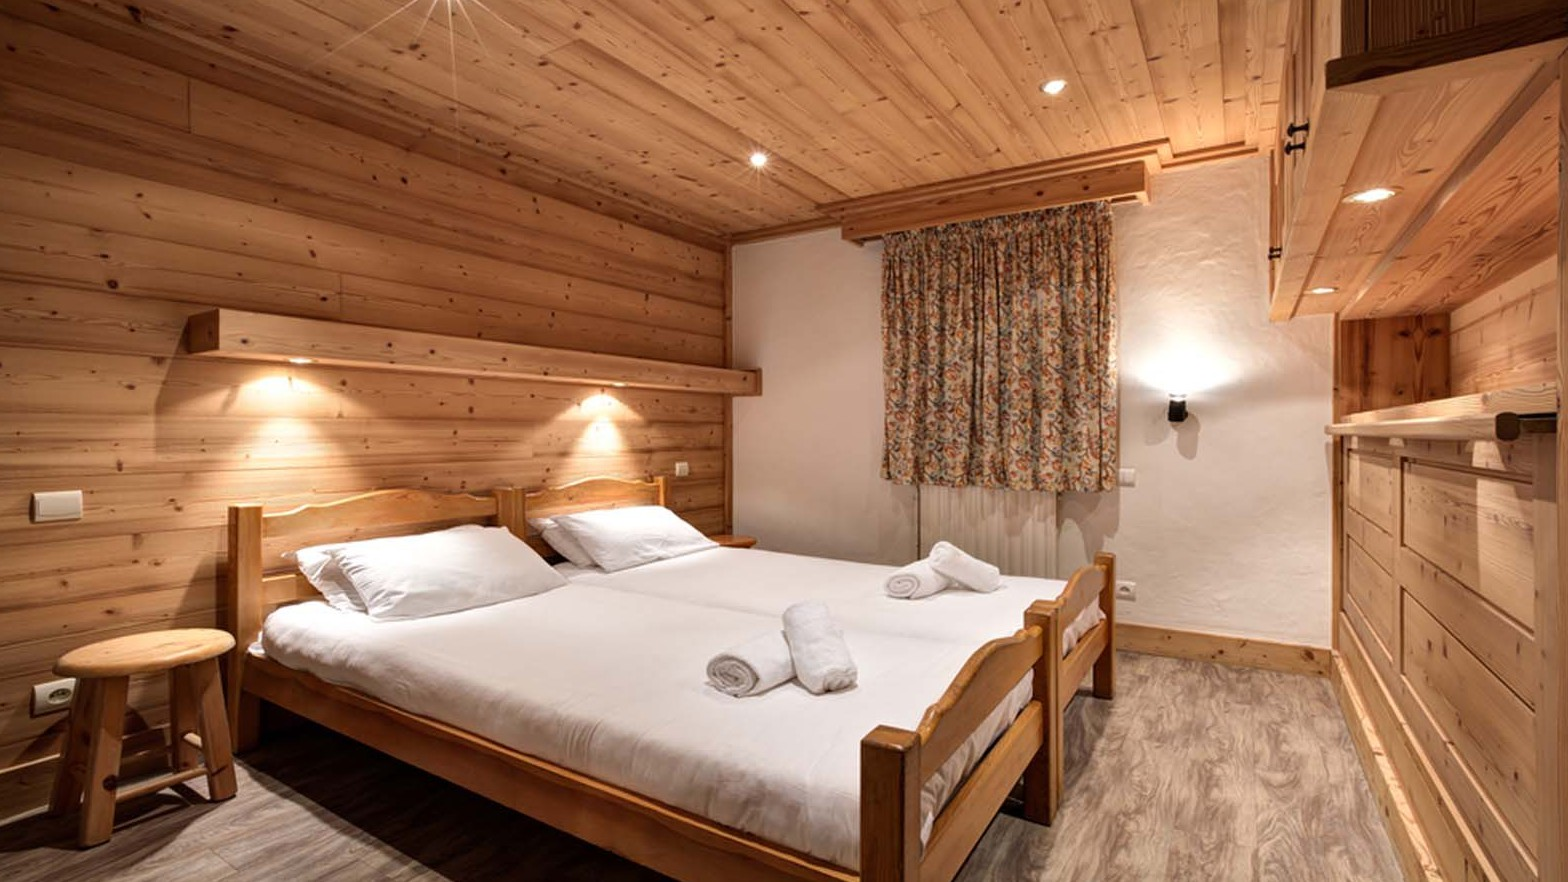 Bedroom, Chalet Elodie - ski chalet in Meribel, France